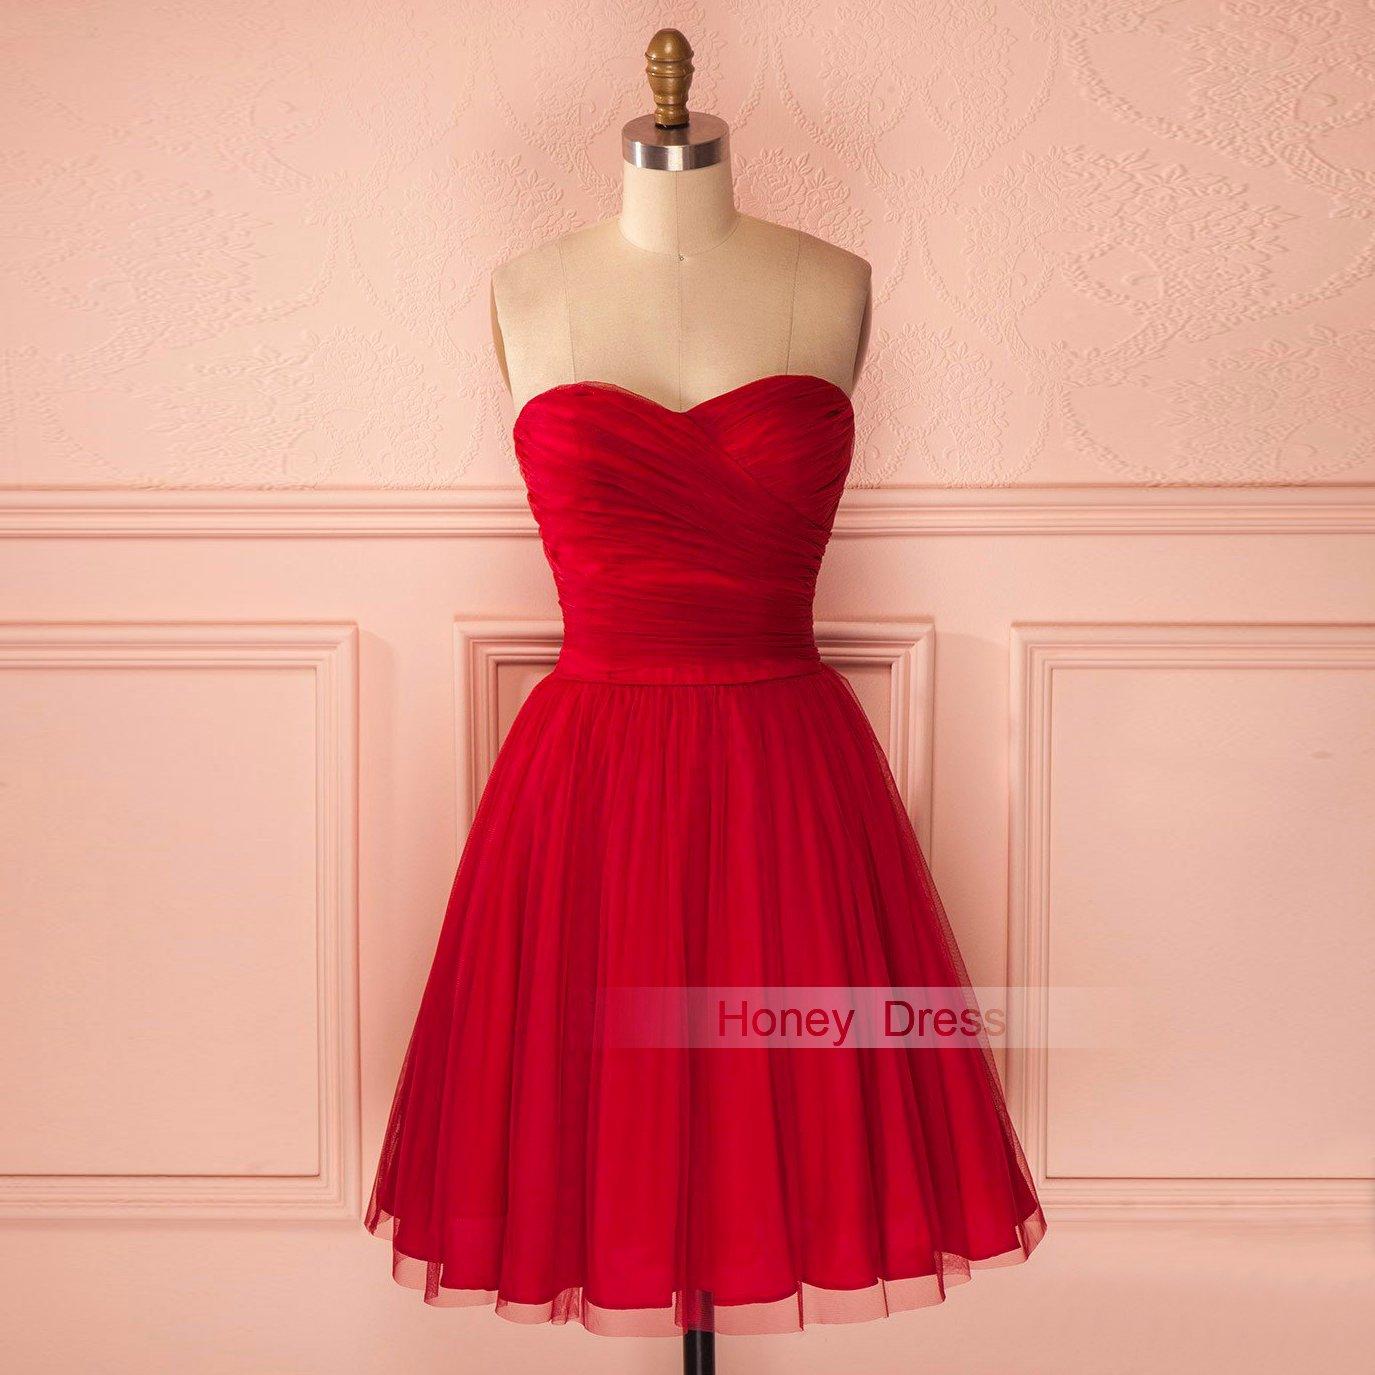 Sweetheart Short Cocktail Dresses